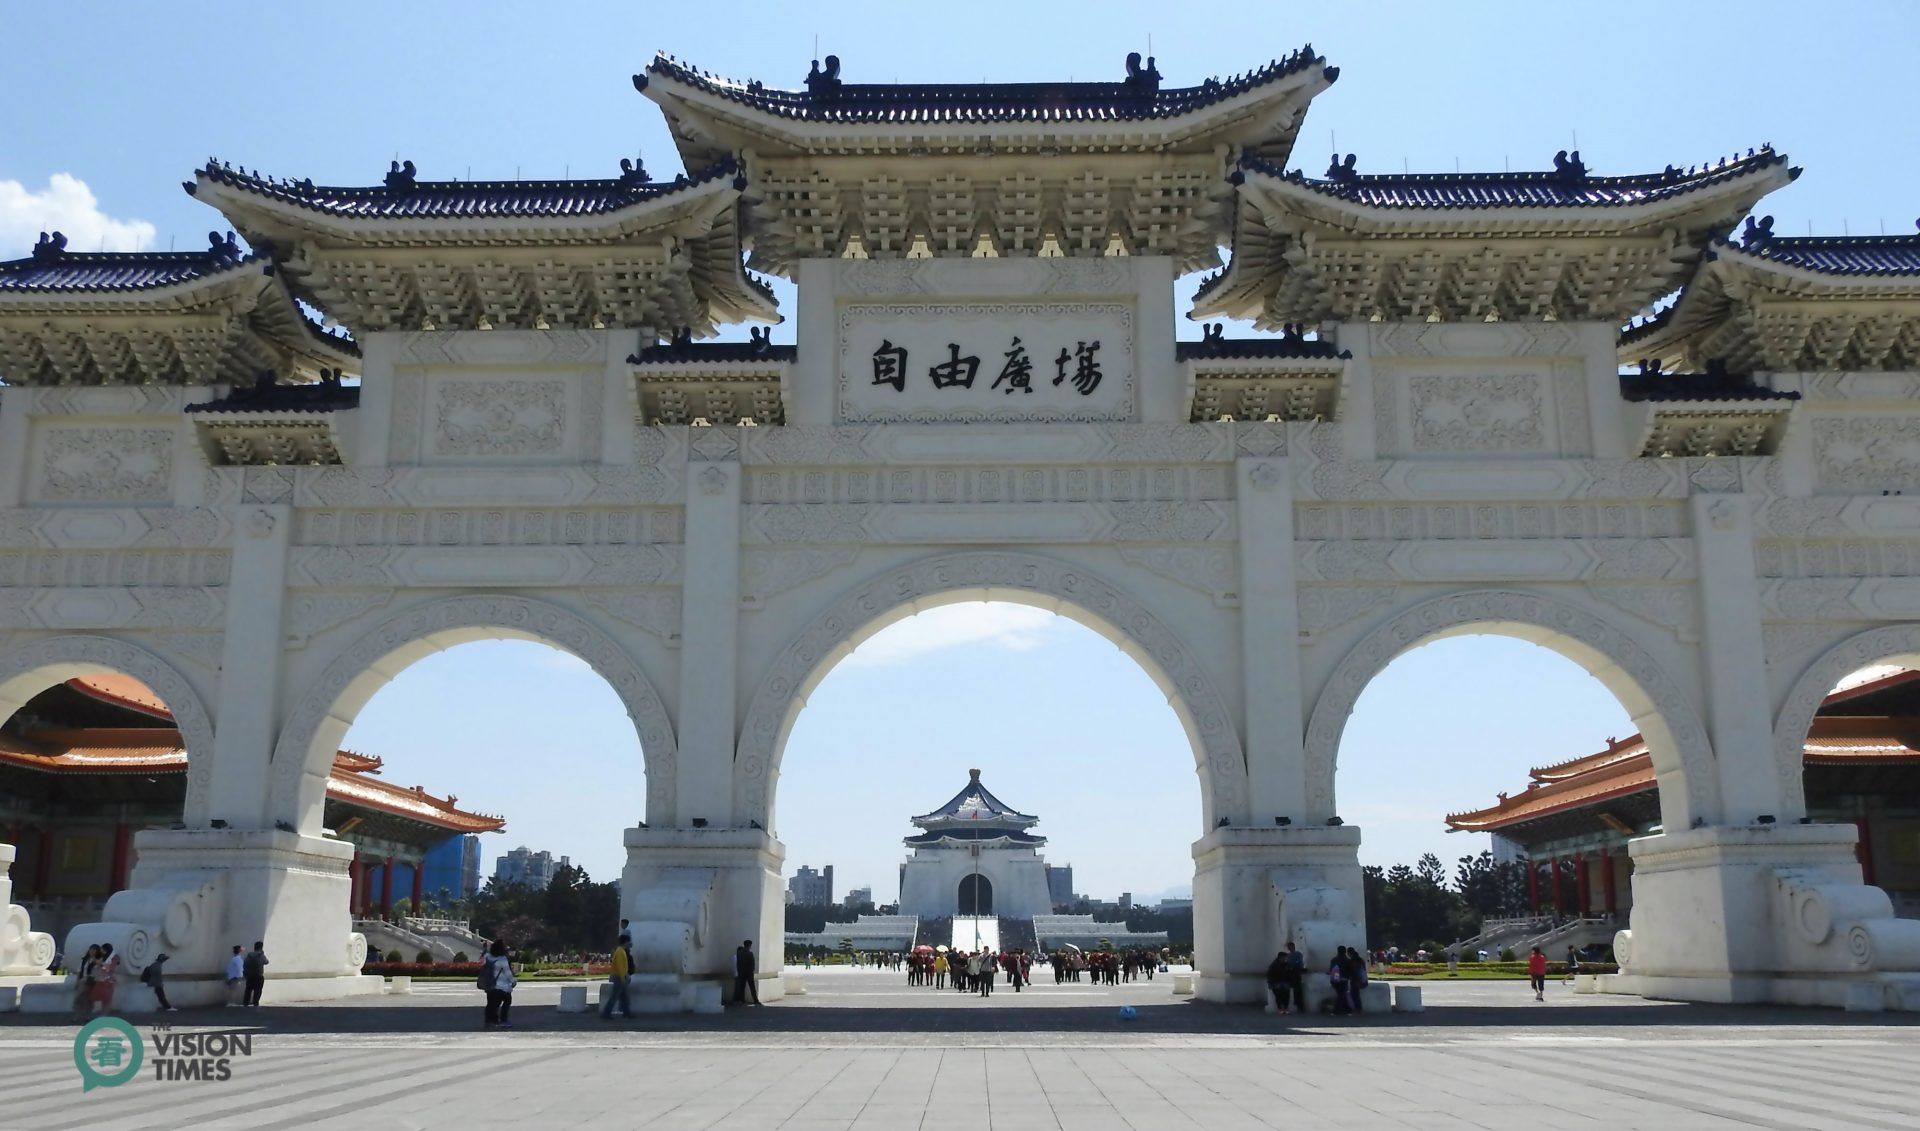 The magnificent Chiang Kai-shek Memorial in Taipei City, Taiwan. (Image: Billy Shyu / Vision Times)